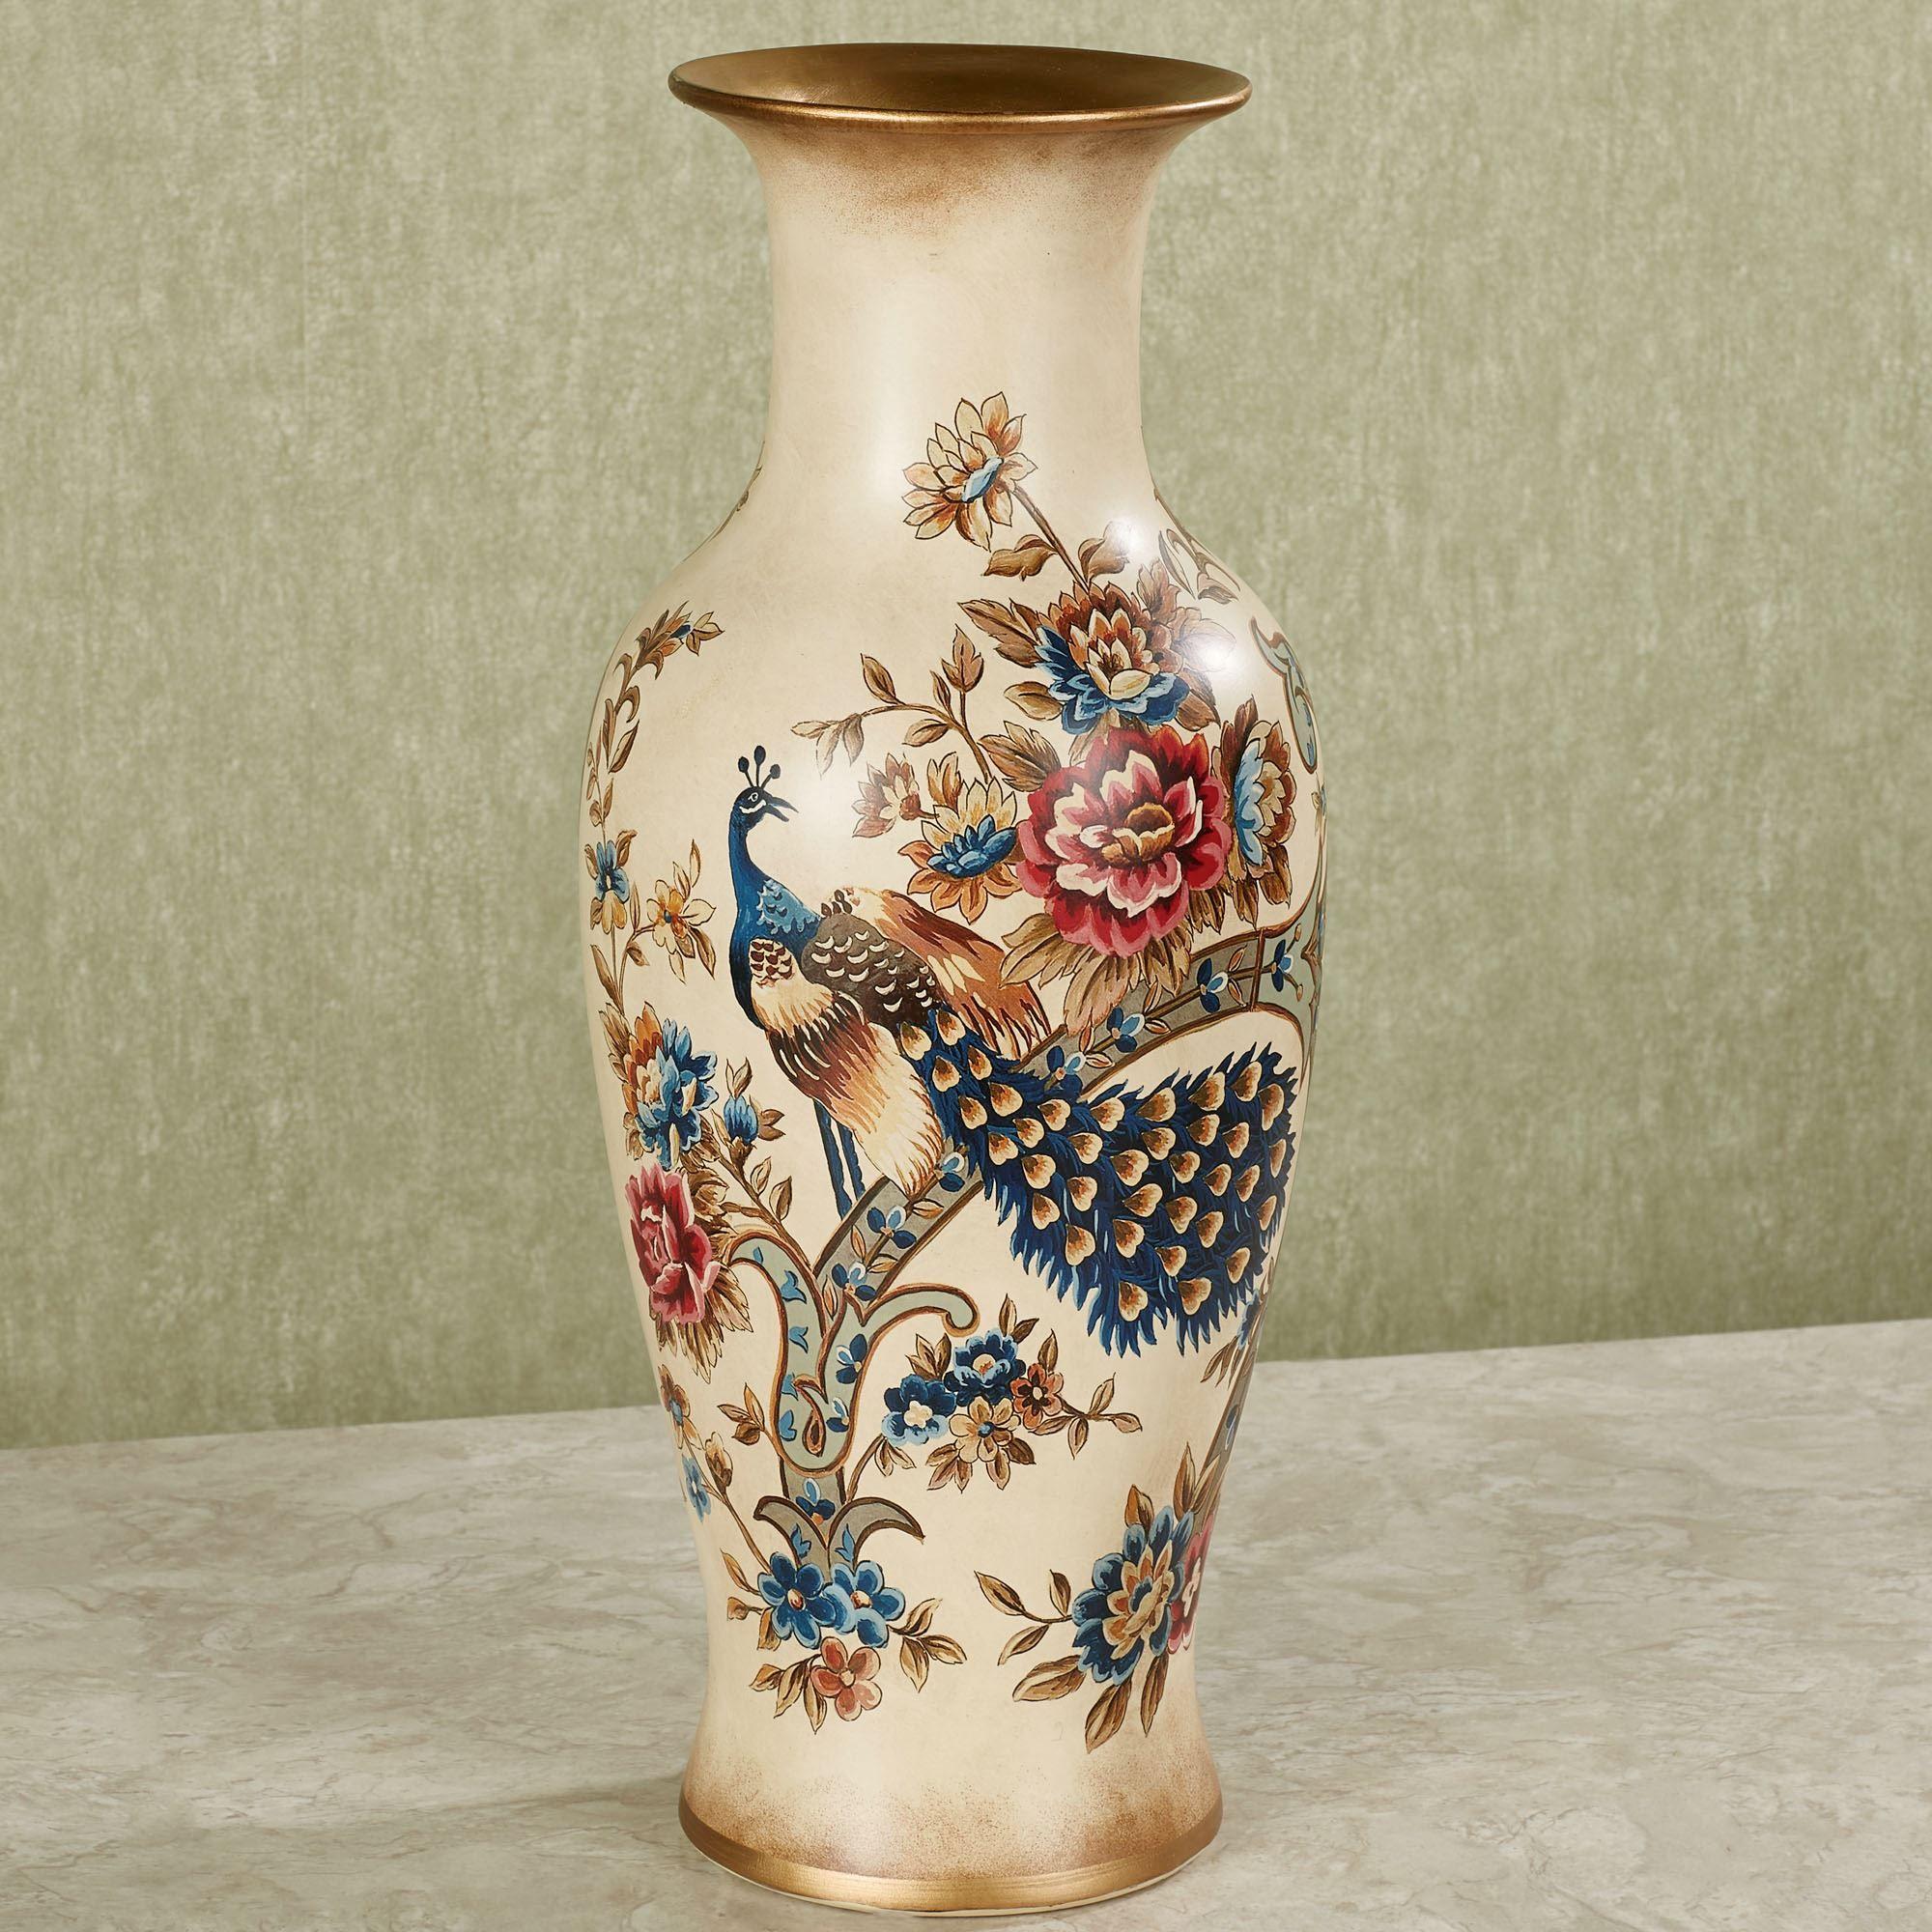 Siroun Peacock Decorative Ceramic Vase